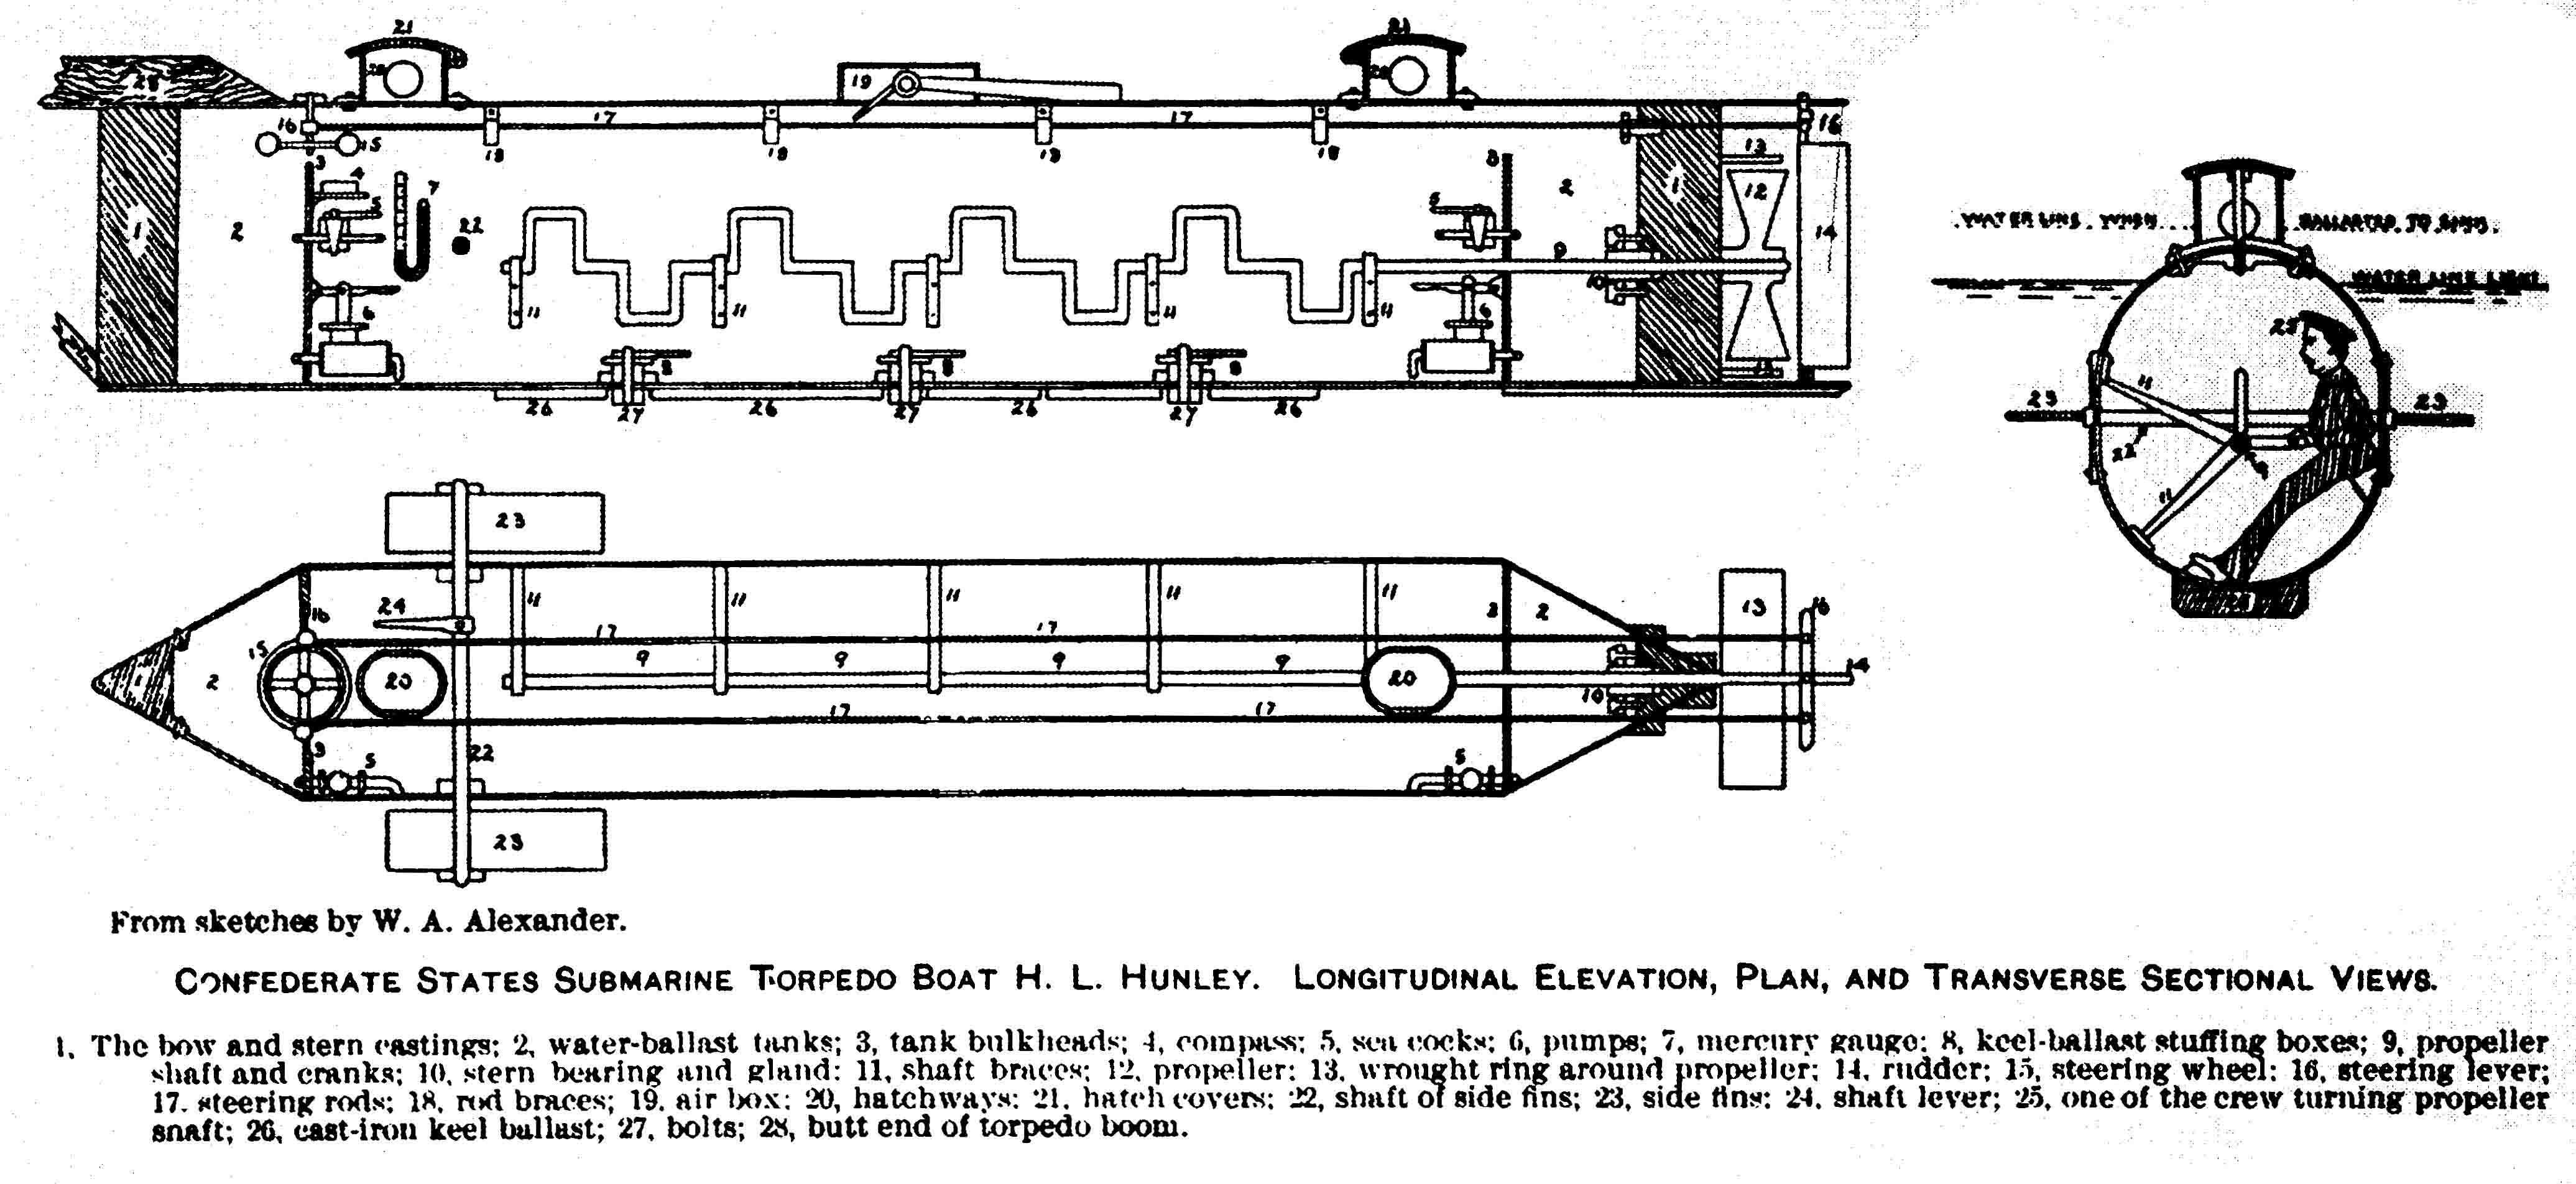 H.L.HUNLEY i disegni  plan